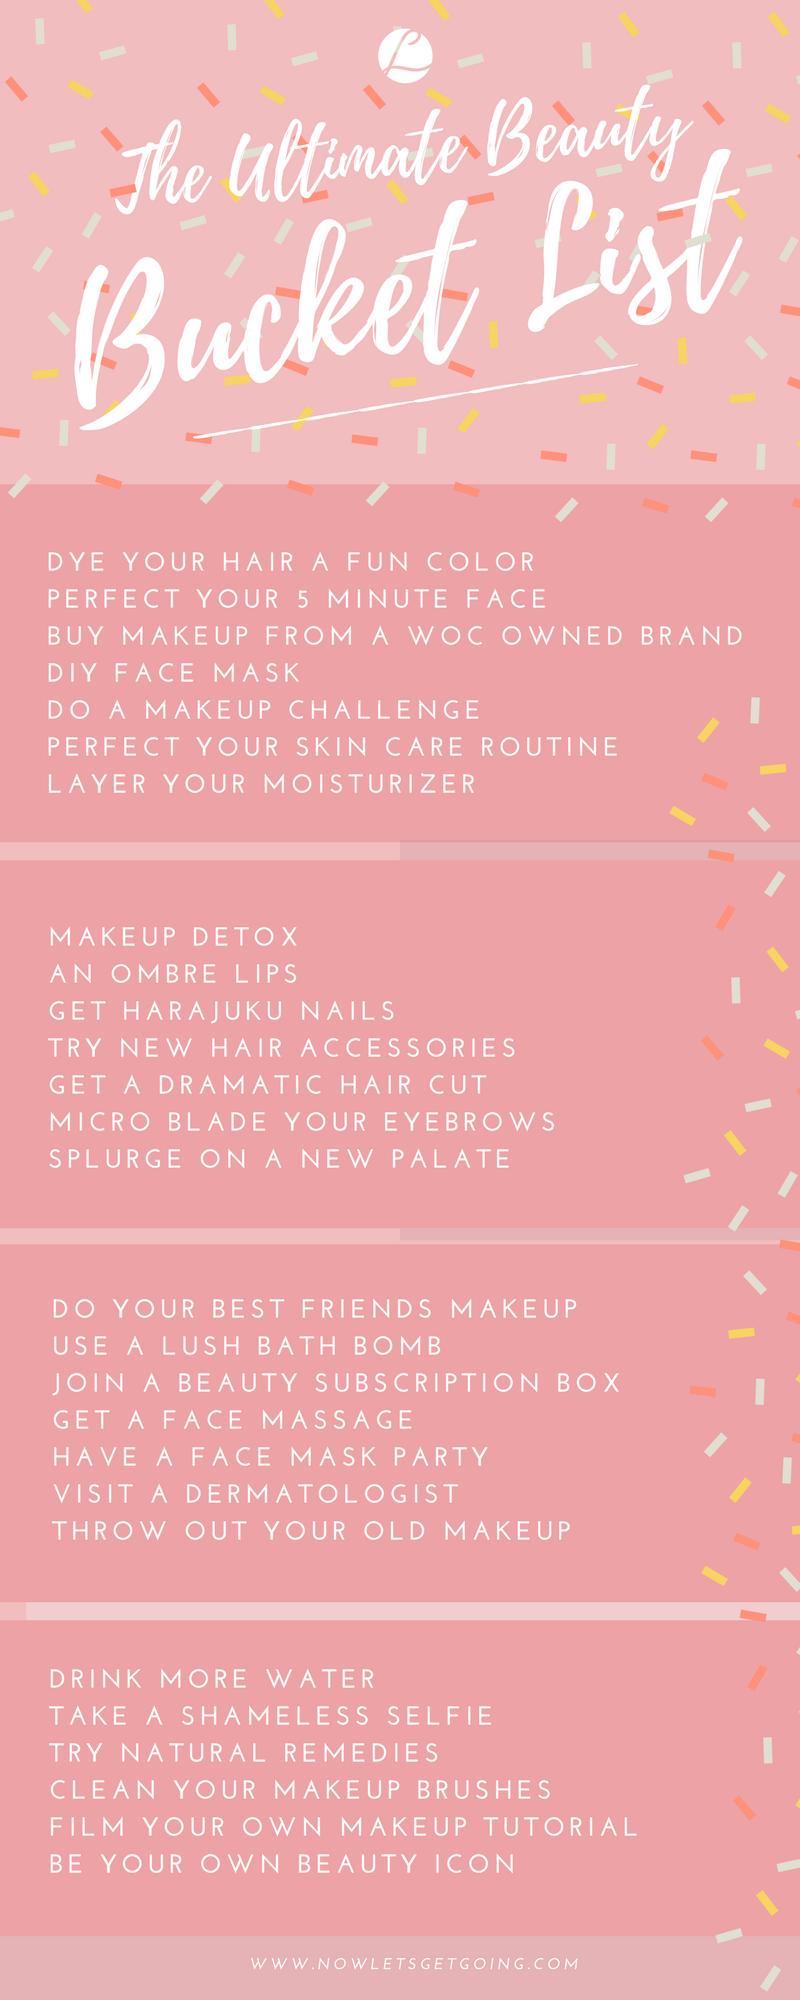 The Ultimate Beauty Bucket List